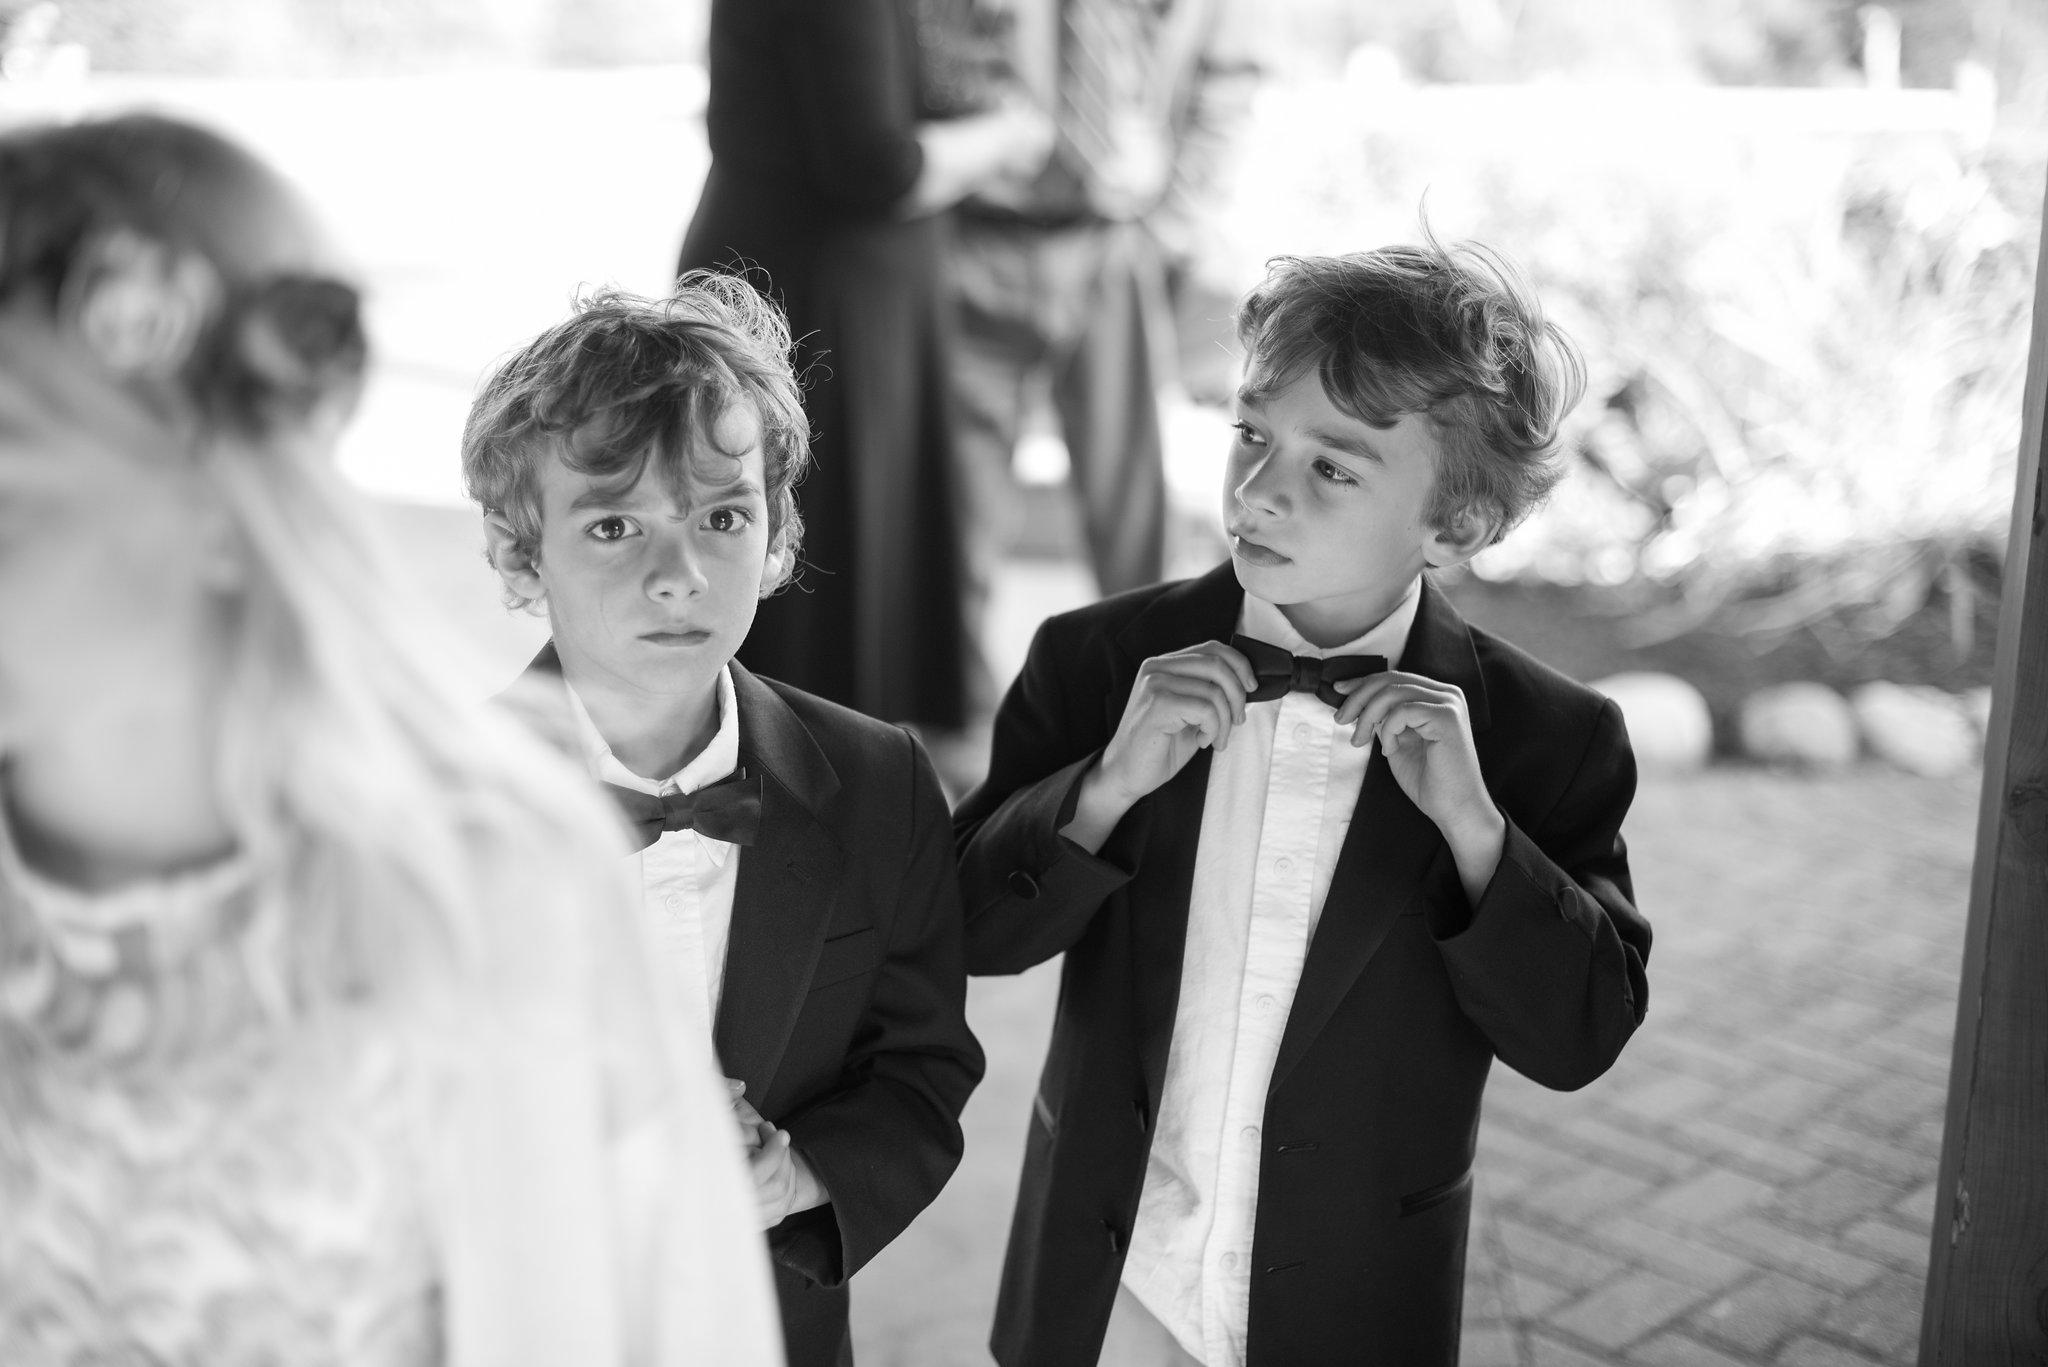 vermont-wedding-photographer-sarah-annay-photography.jpg3.jpg